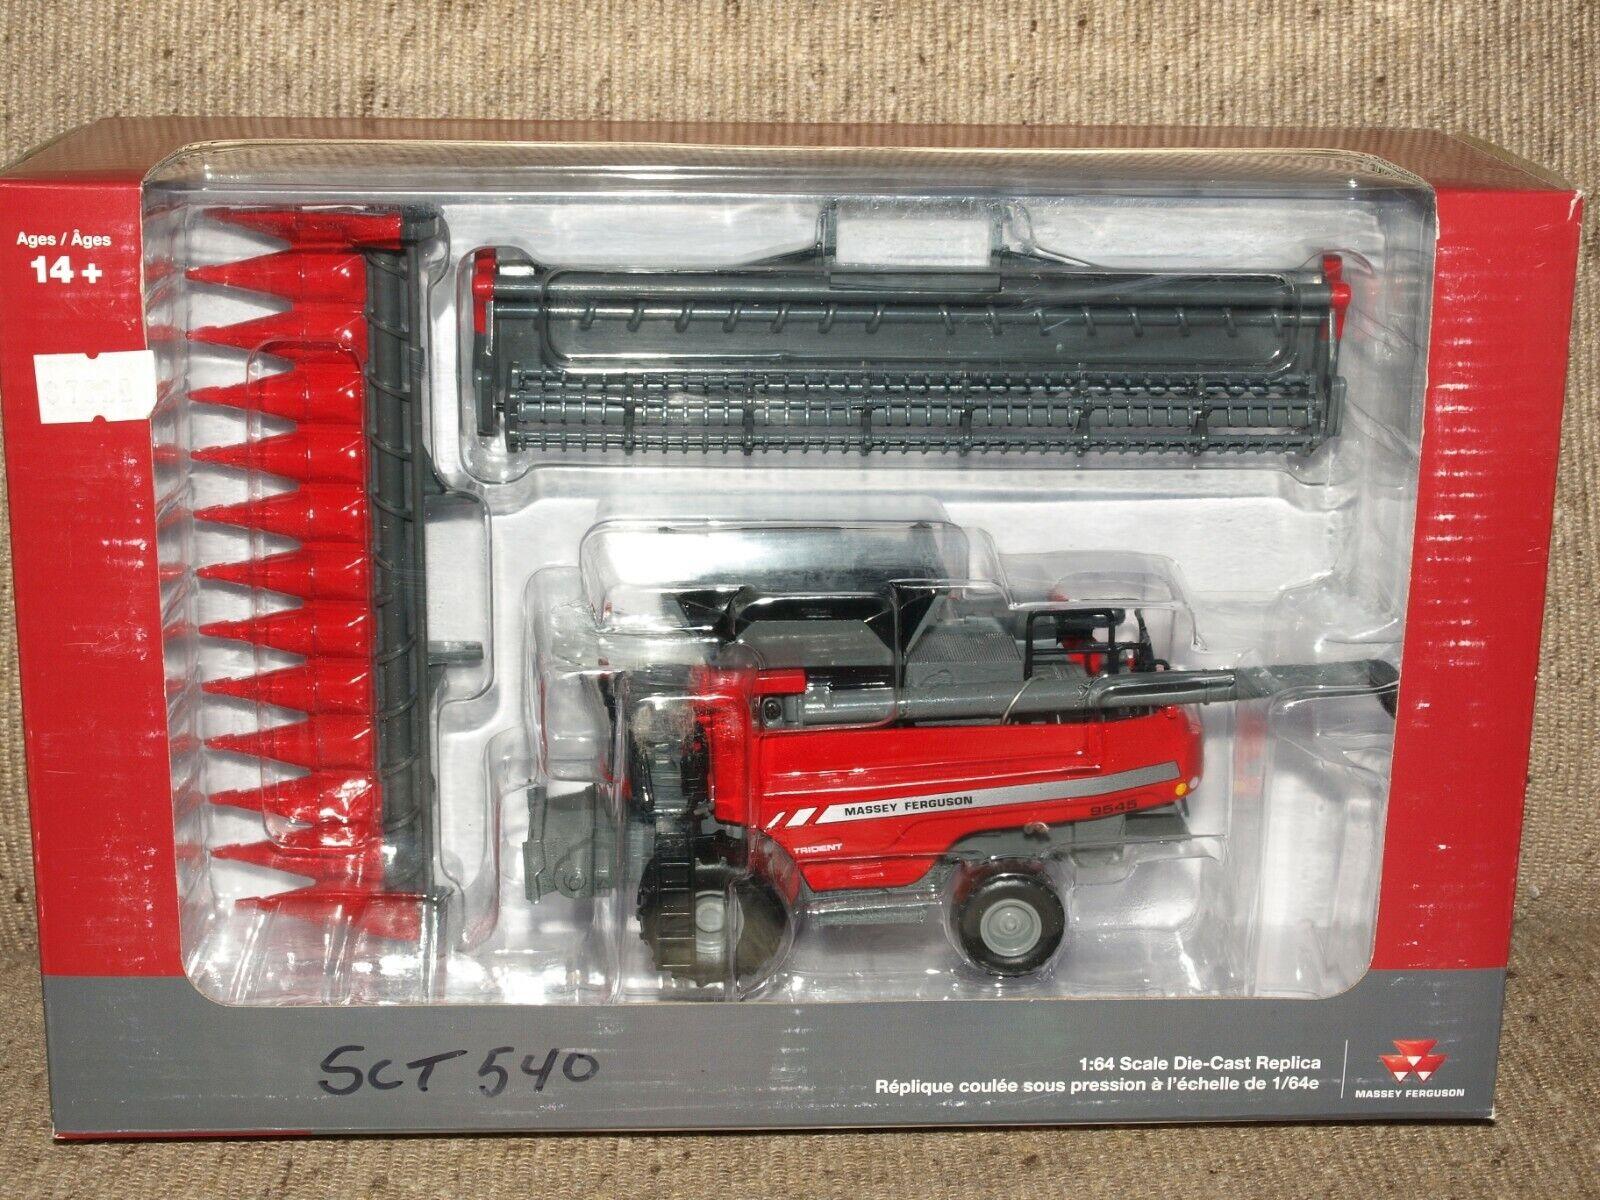 Massey Ferguson 9545 Trident Diecast Combine  1:64 SpecCast SCT 540 Grain/Corn